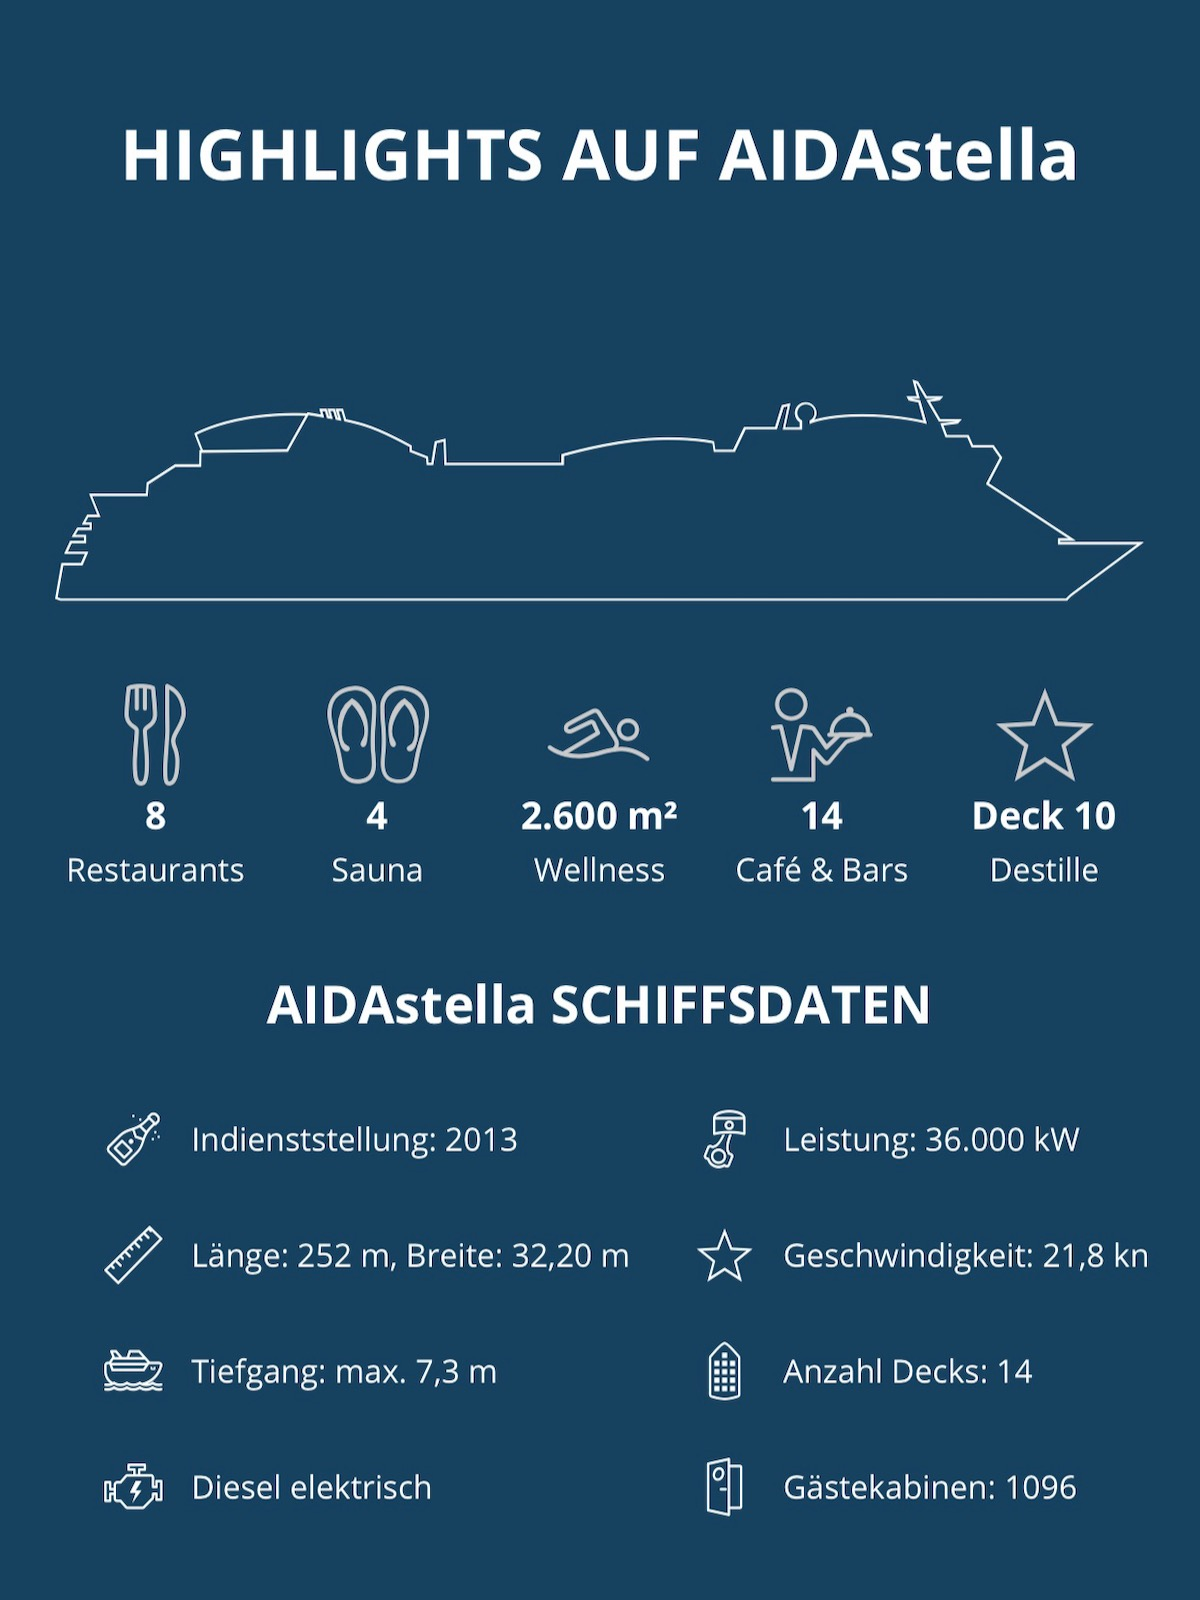 aida-cruises-ships-aidastella-daten-mobil